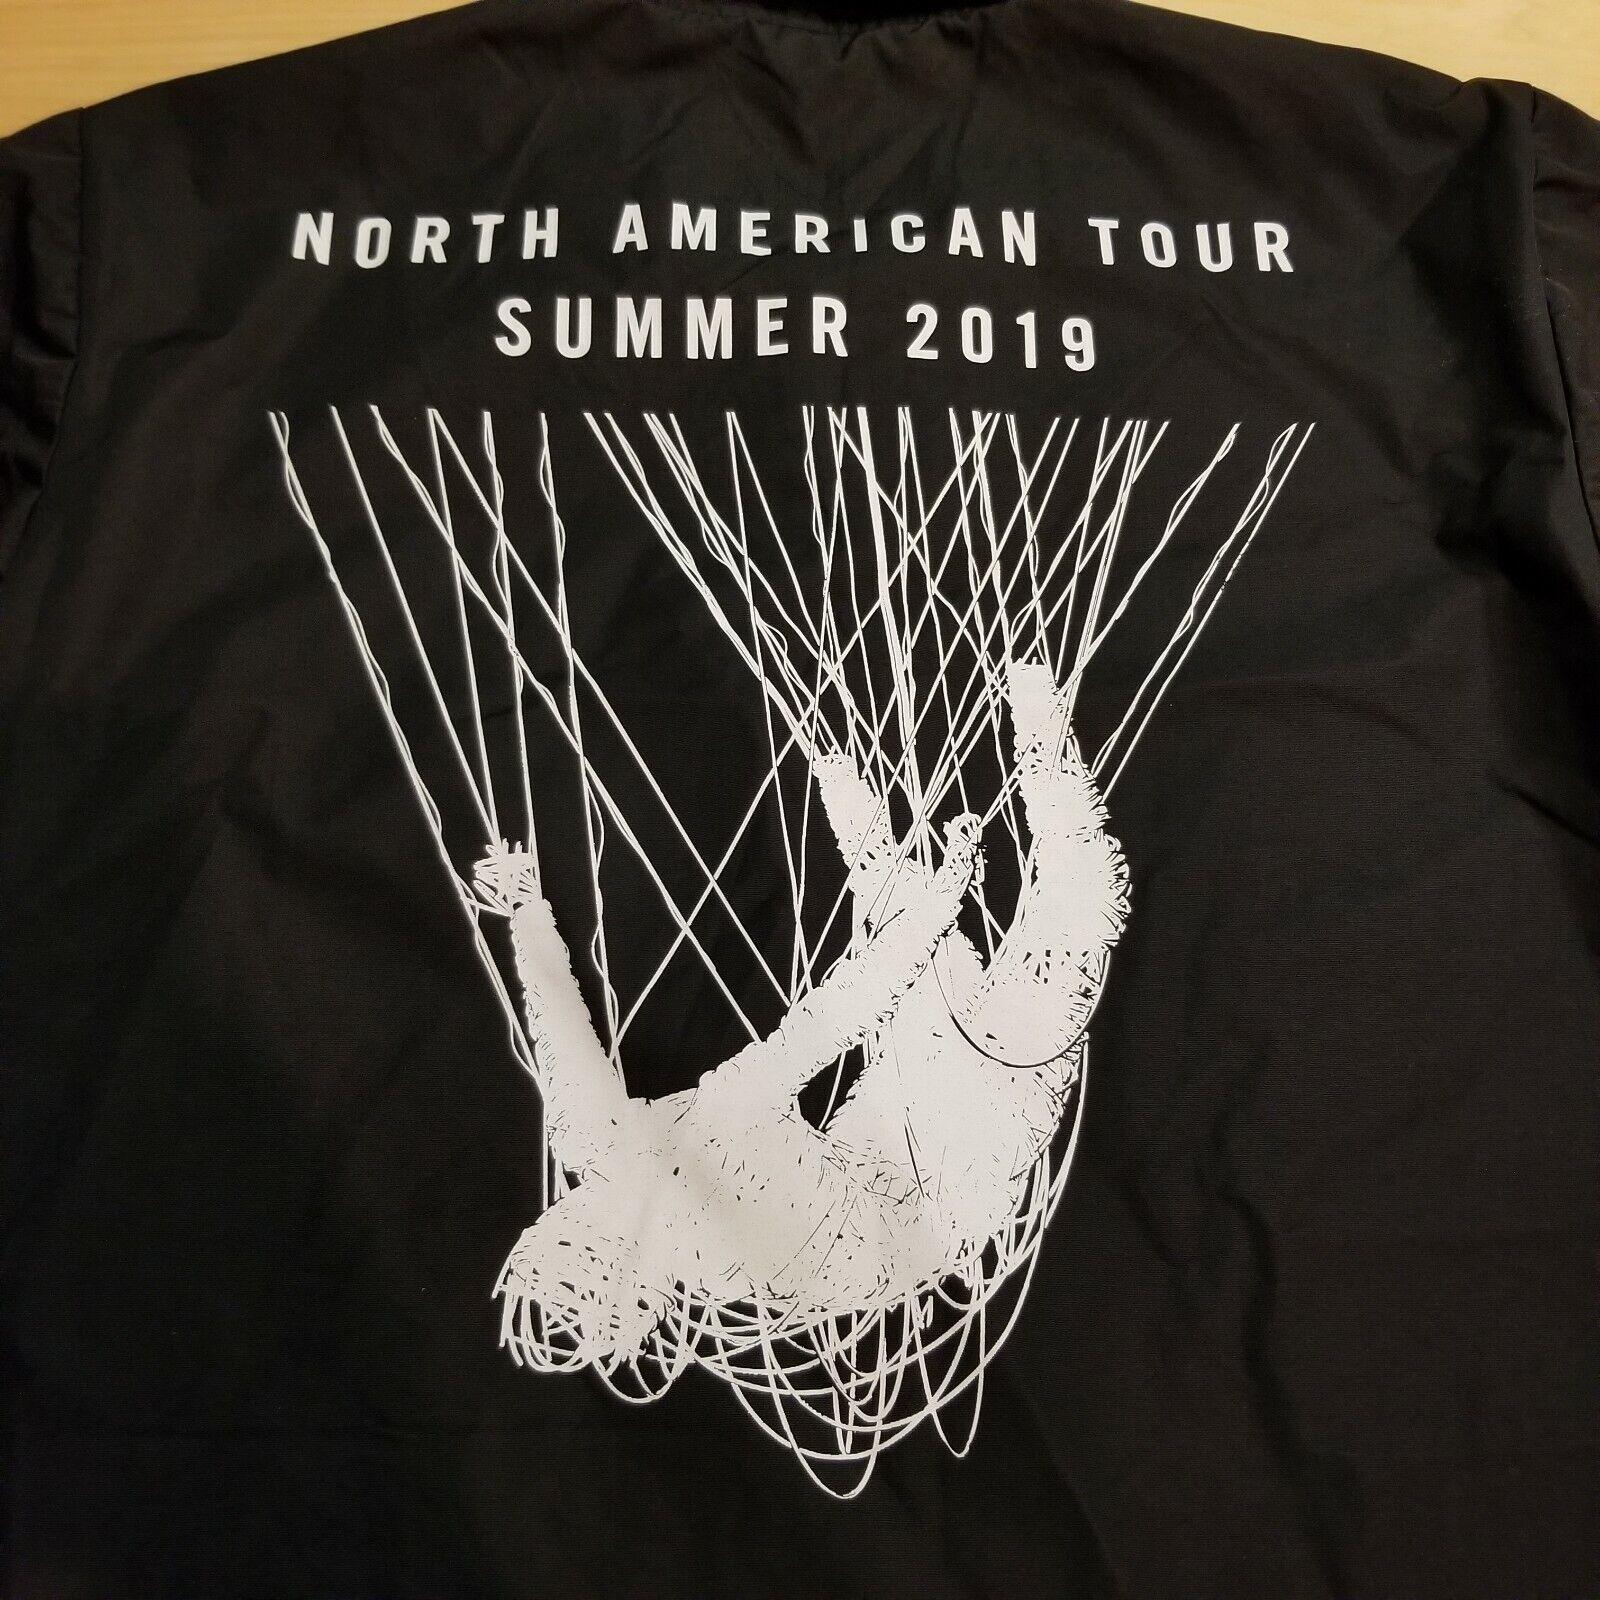 KORN Band 2019 Concert Tour Jacket Windbreaker, Black Size Large - Ships Free